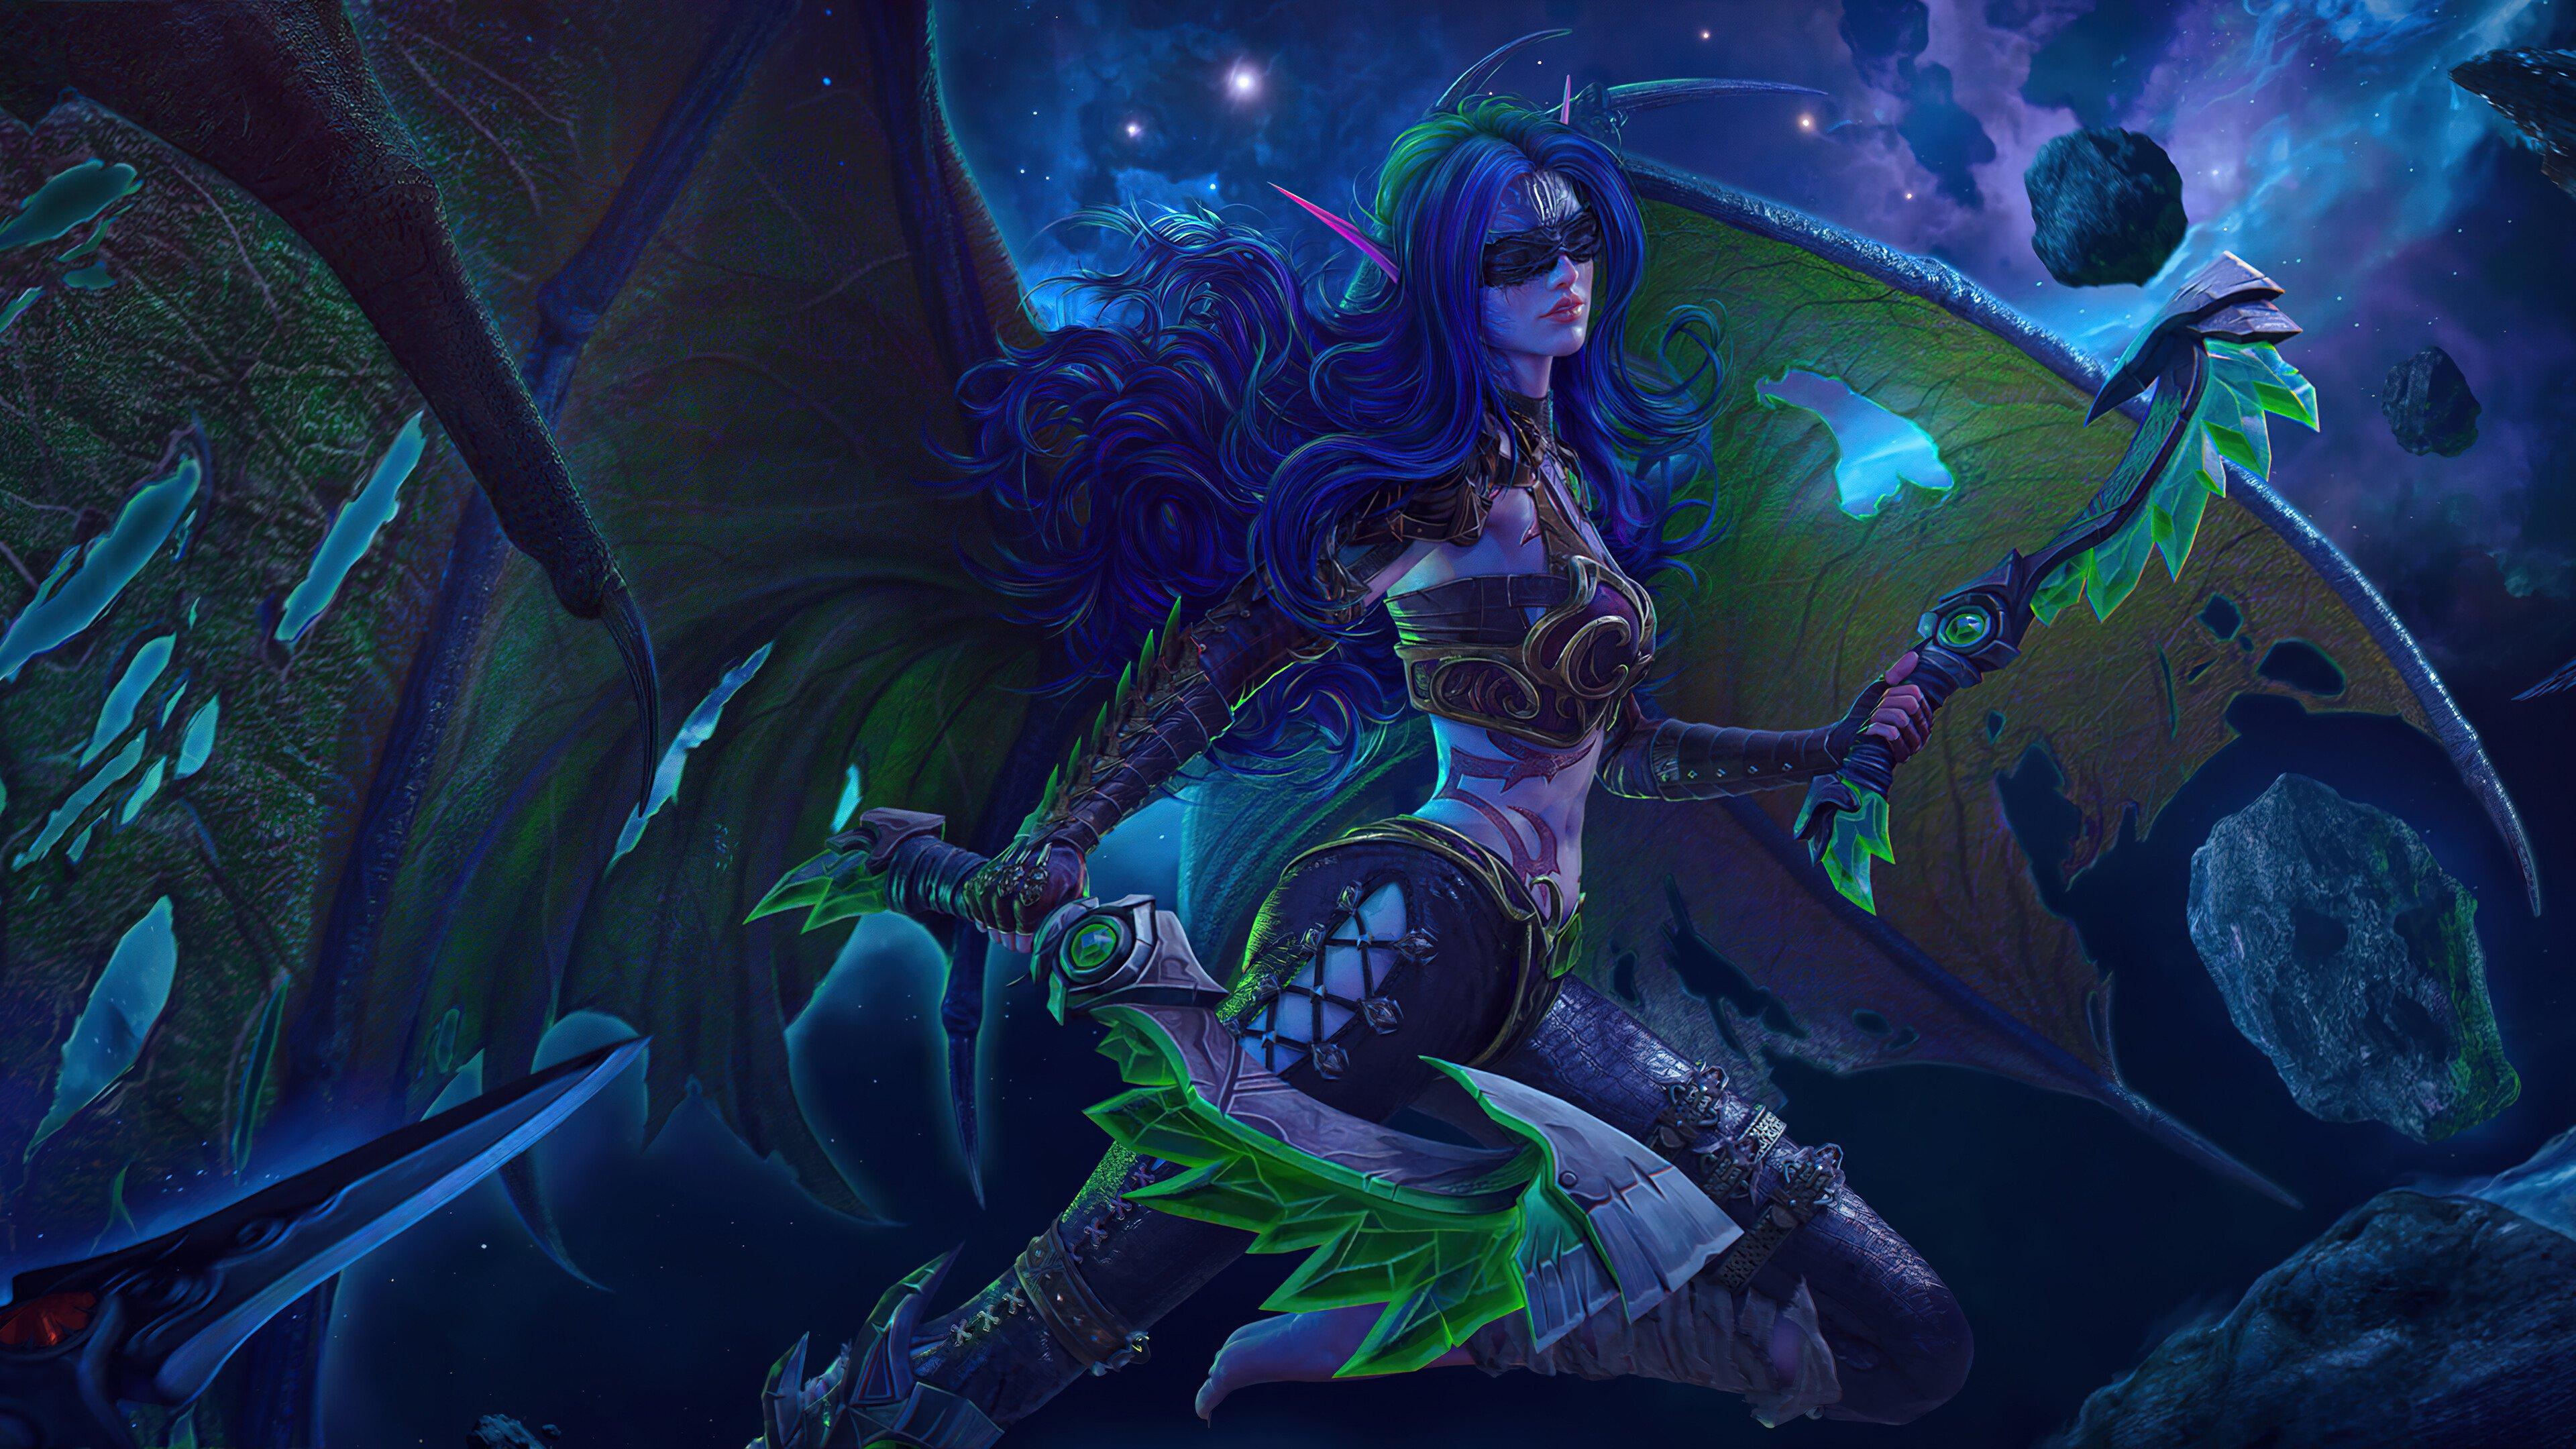 Fondos de pantalla World of Warcraft Demon Hunter